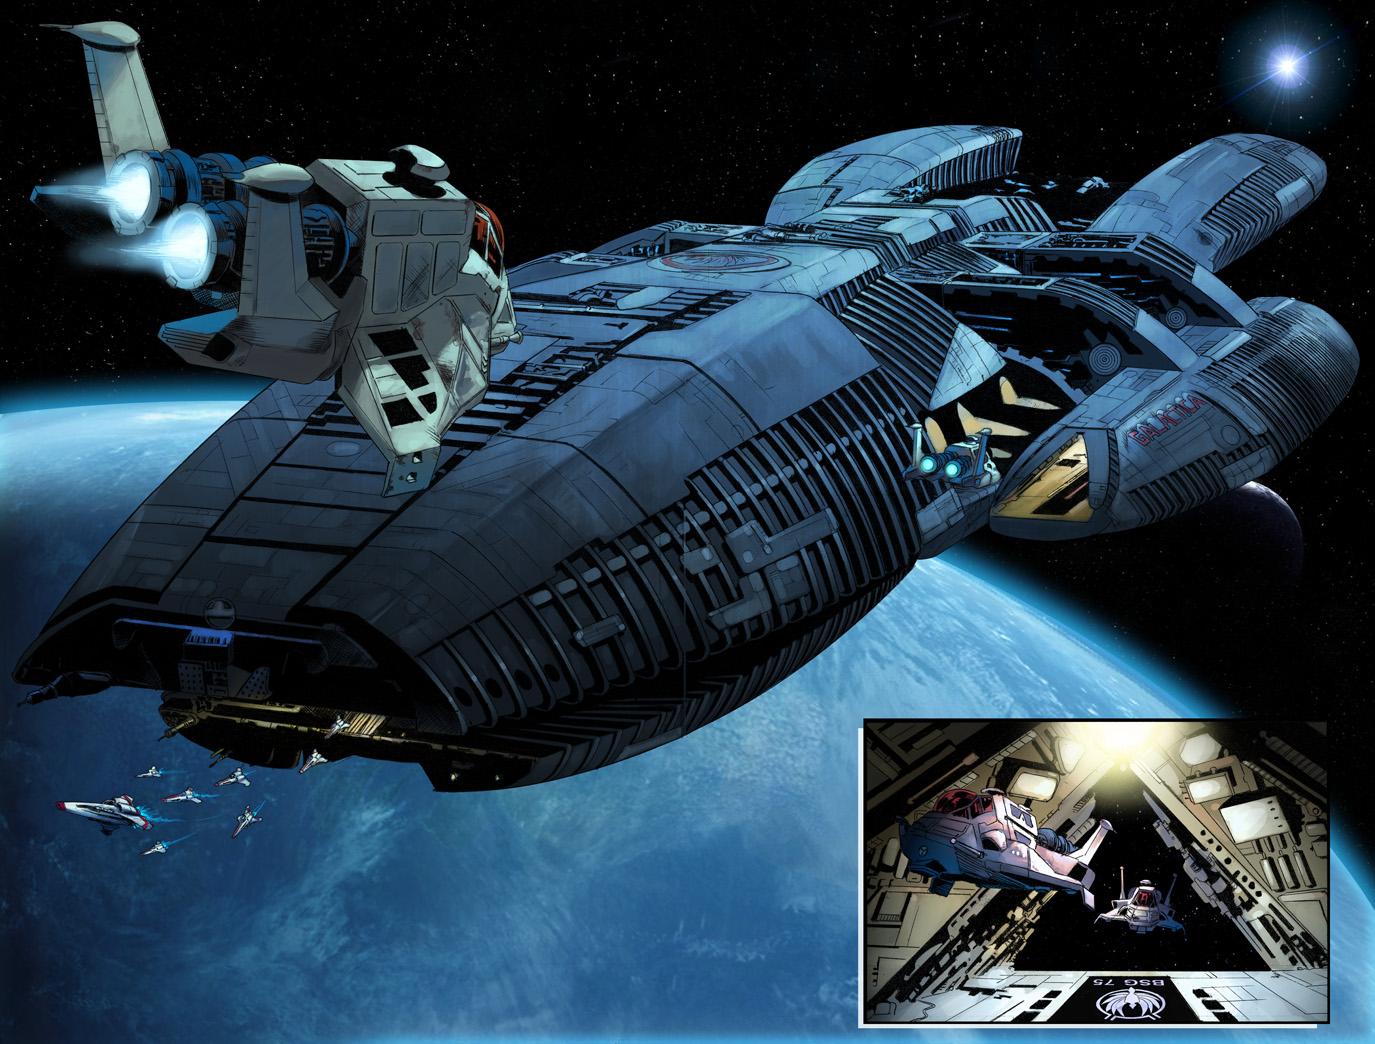 Battlestar Galactica Большой корабль в пути